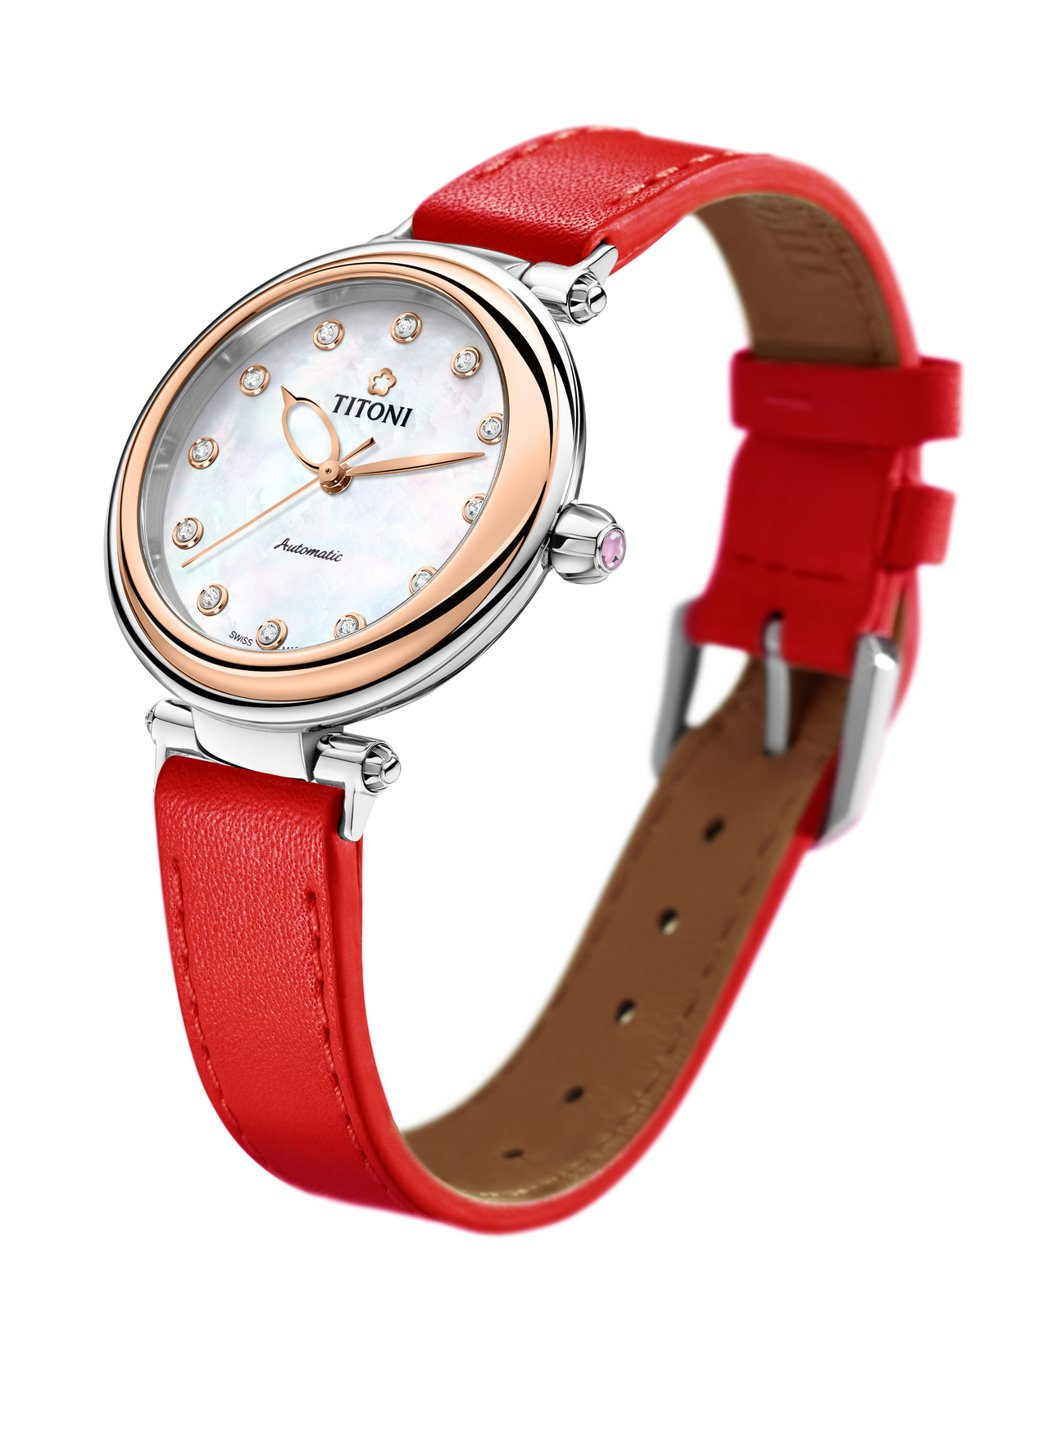 Miss Lovely快拆系列腕表,每一款都採用珍珠母貝表盤搭配寶石時標,約35...